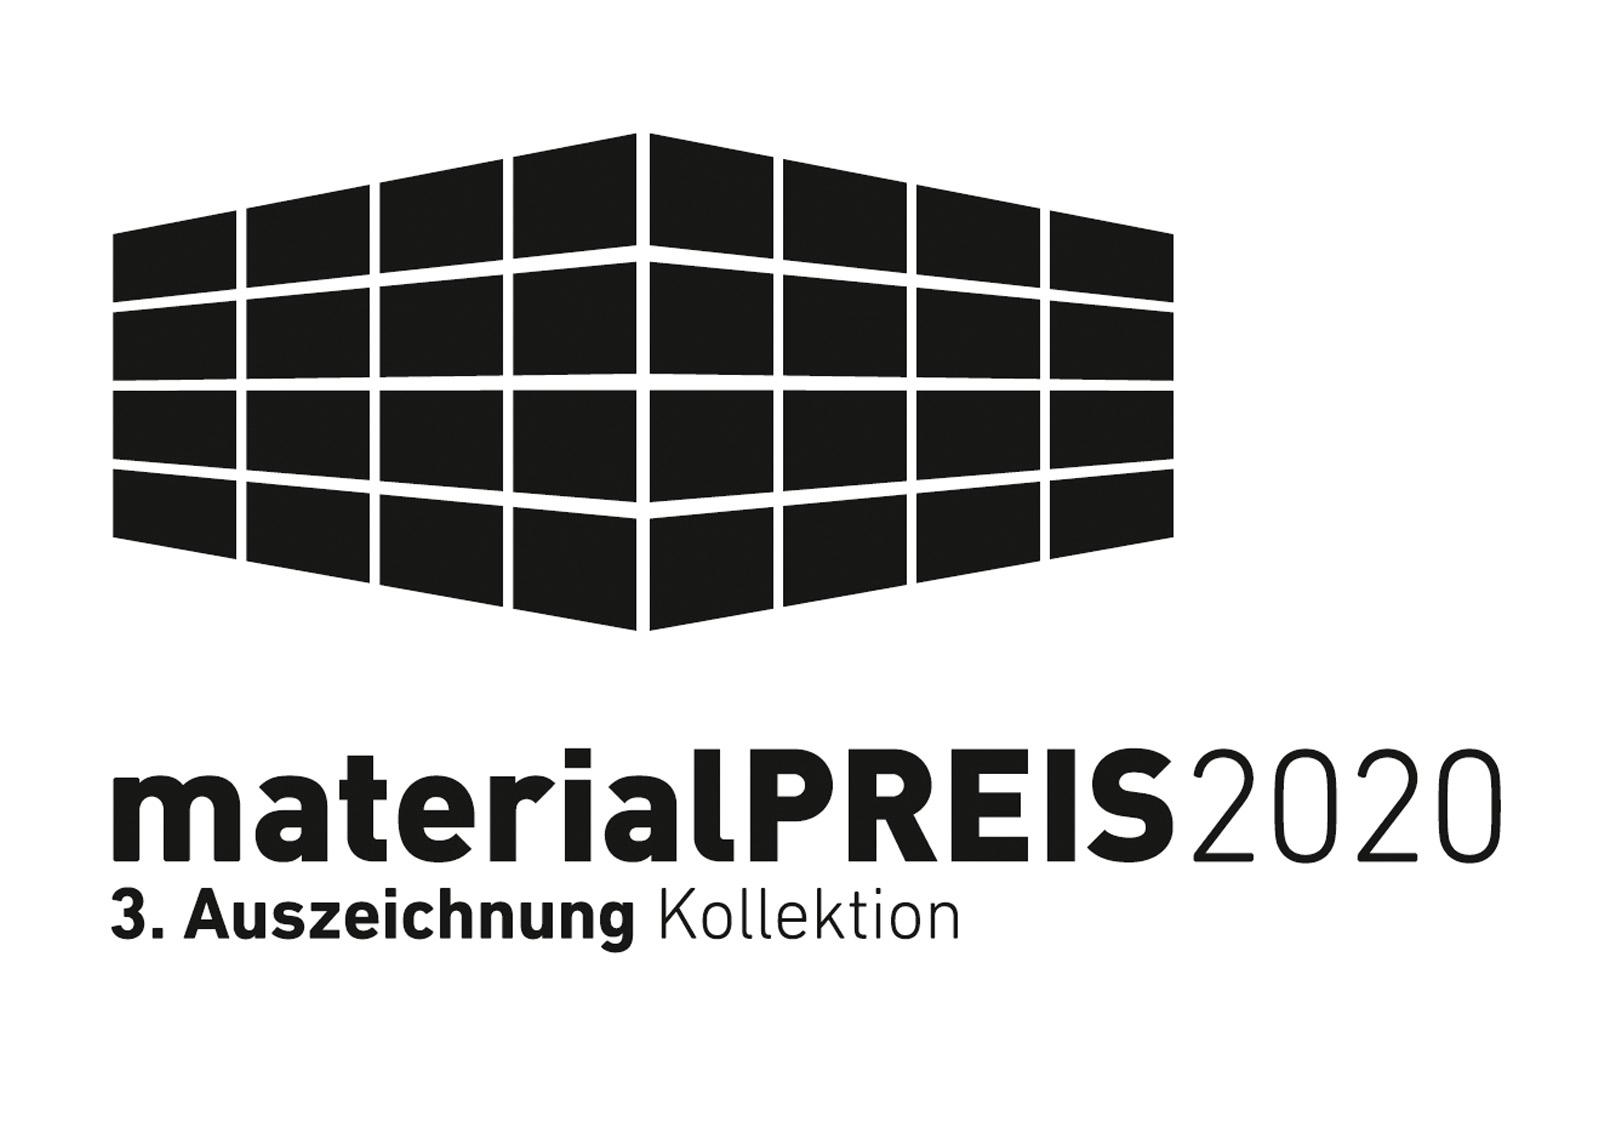 Material PREIS 2020 - Ceramic District